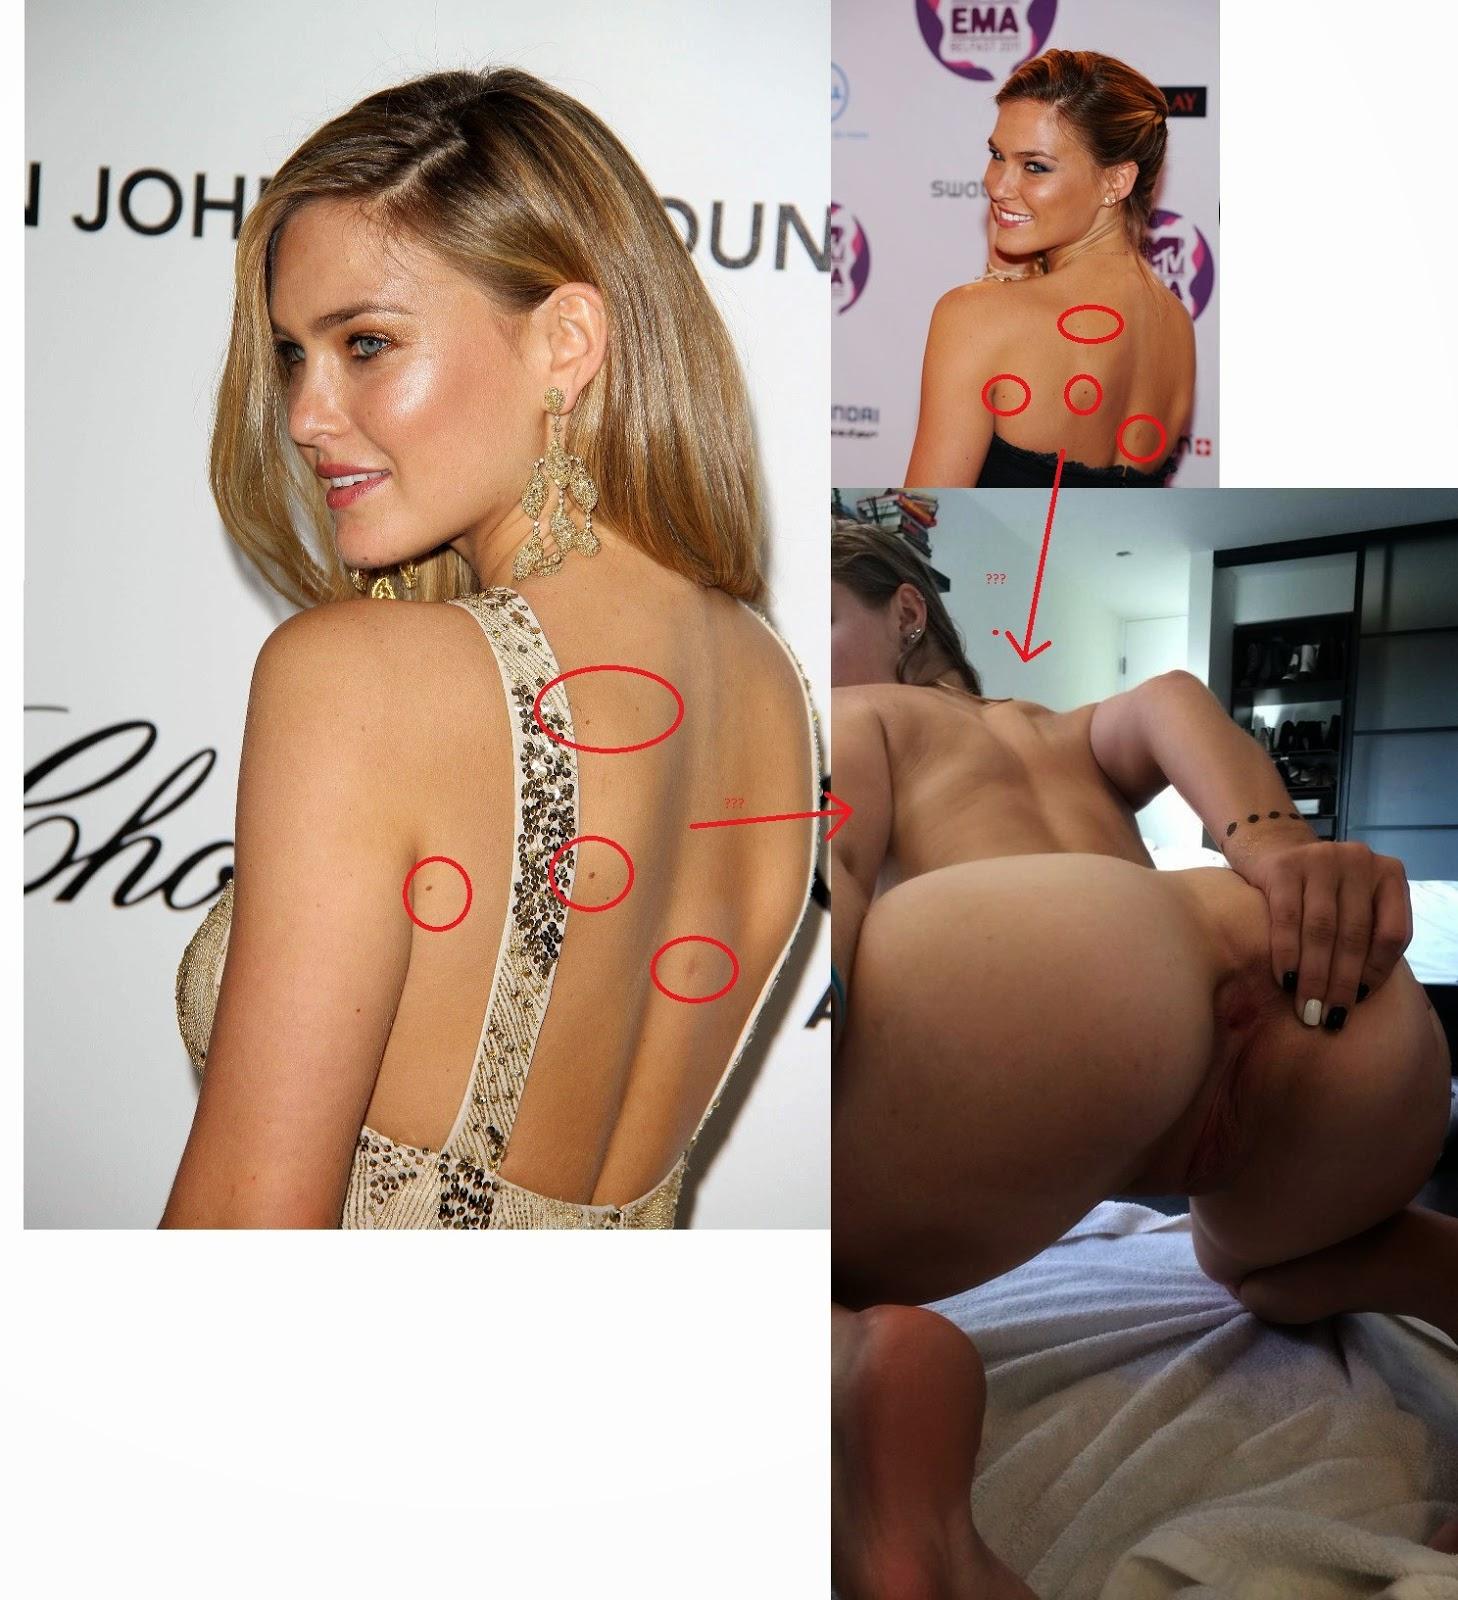 Topless Magda Furman naked (15 photos), Pussy, Paparazzi, Instagram, panties 2017